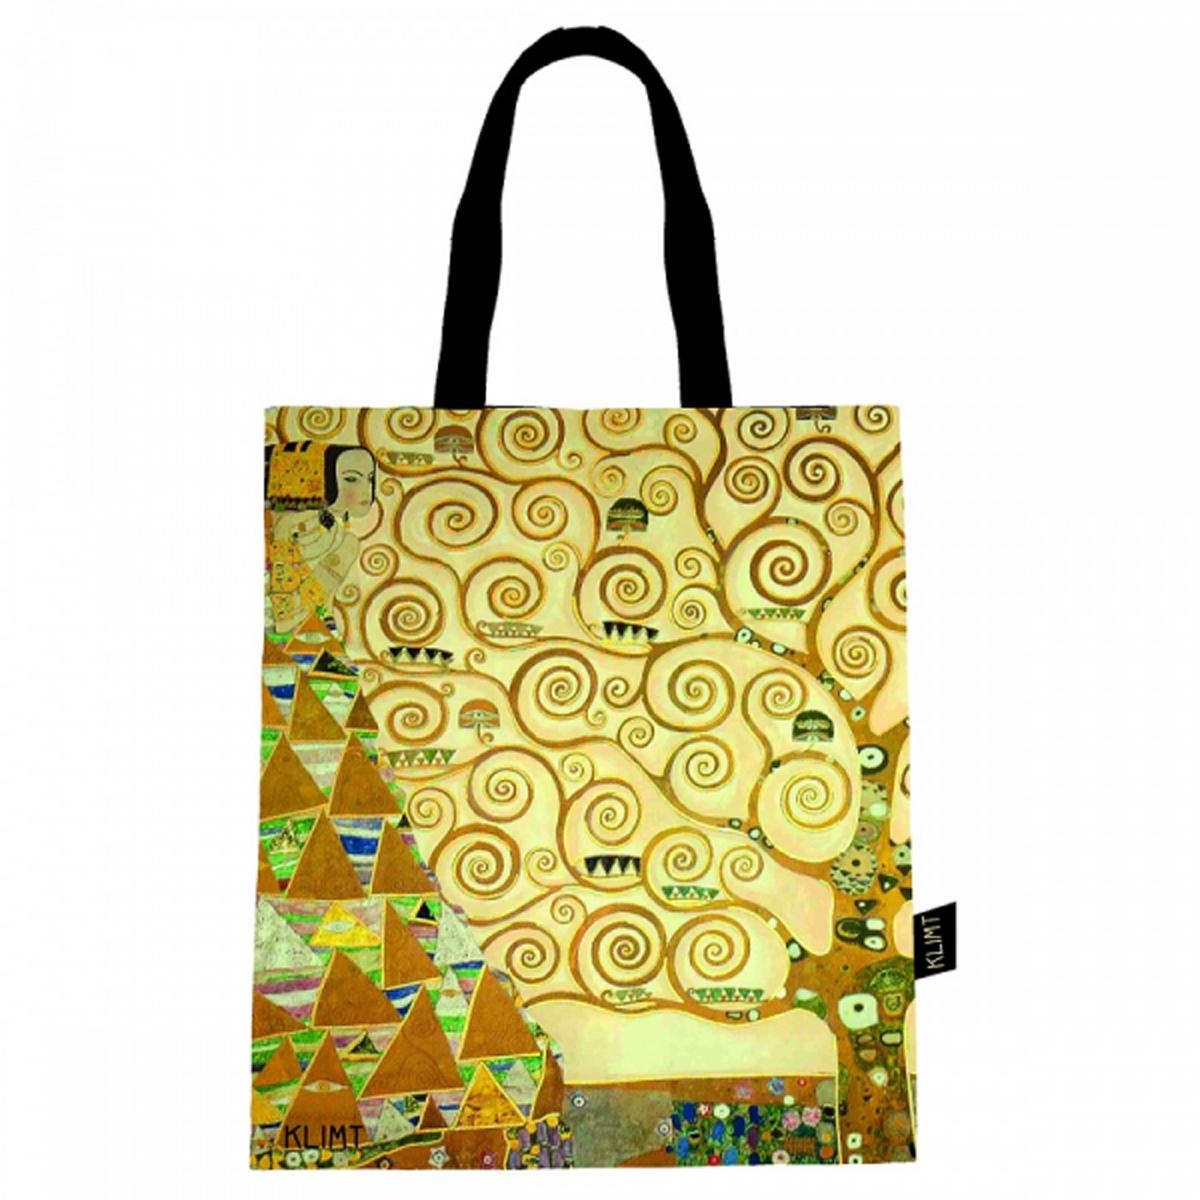 Sac coton / tote bag \'Gustav Klimt\' (Arbre de vie) - 44x38 cm - [R2981]